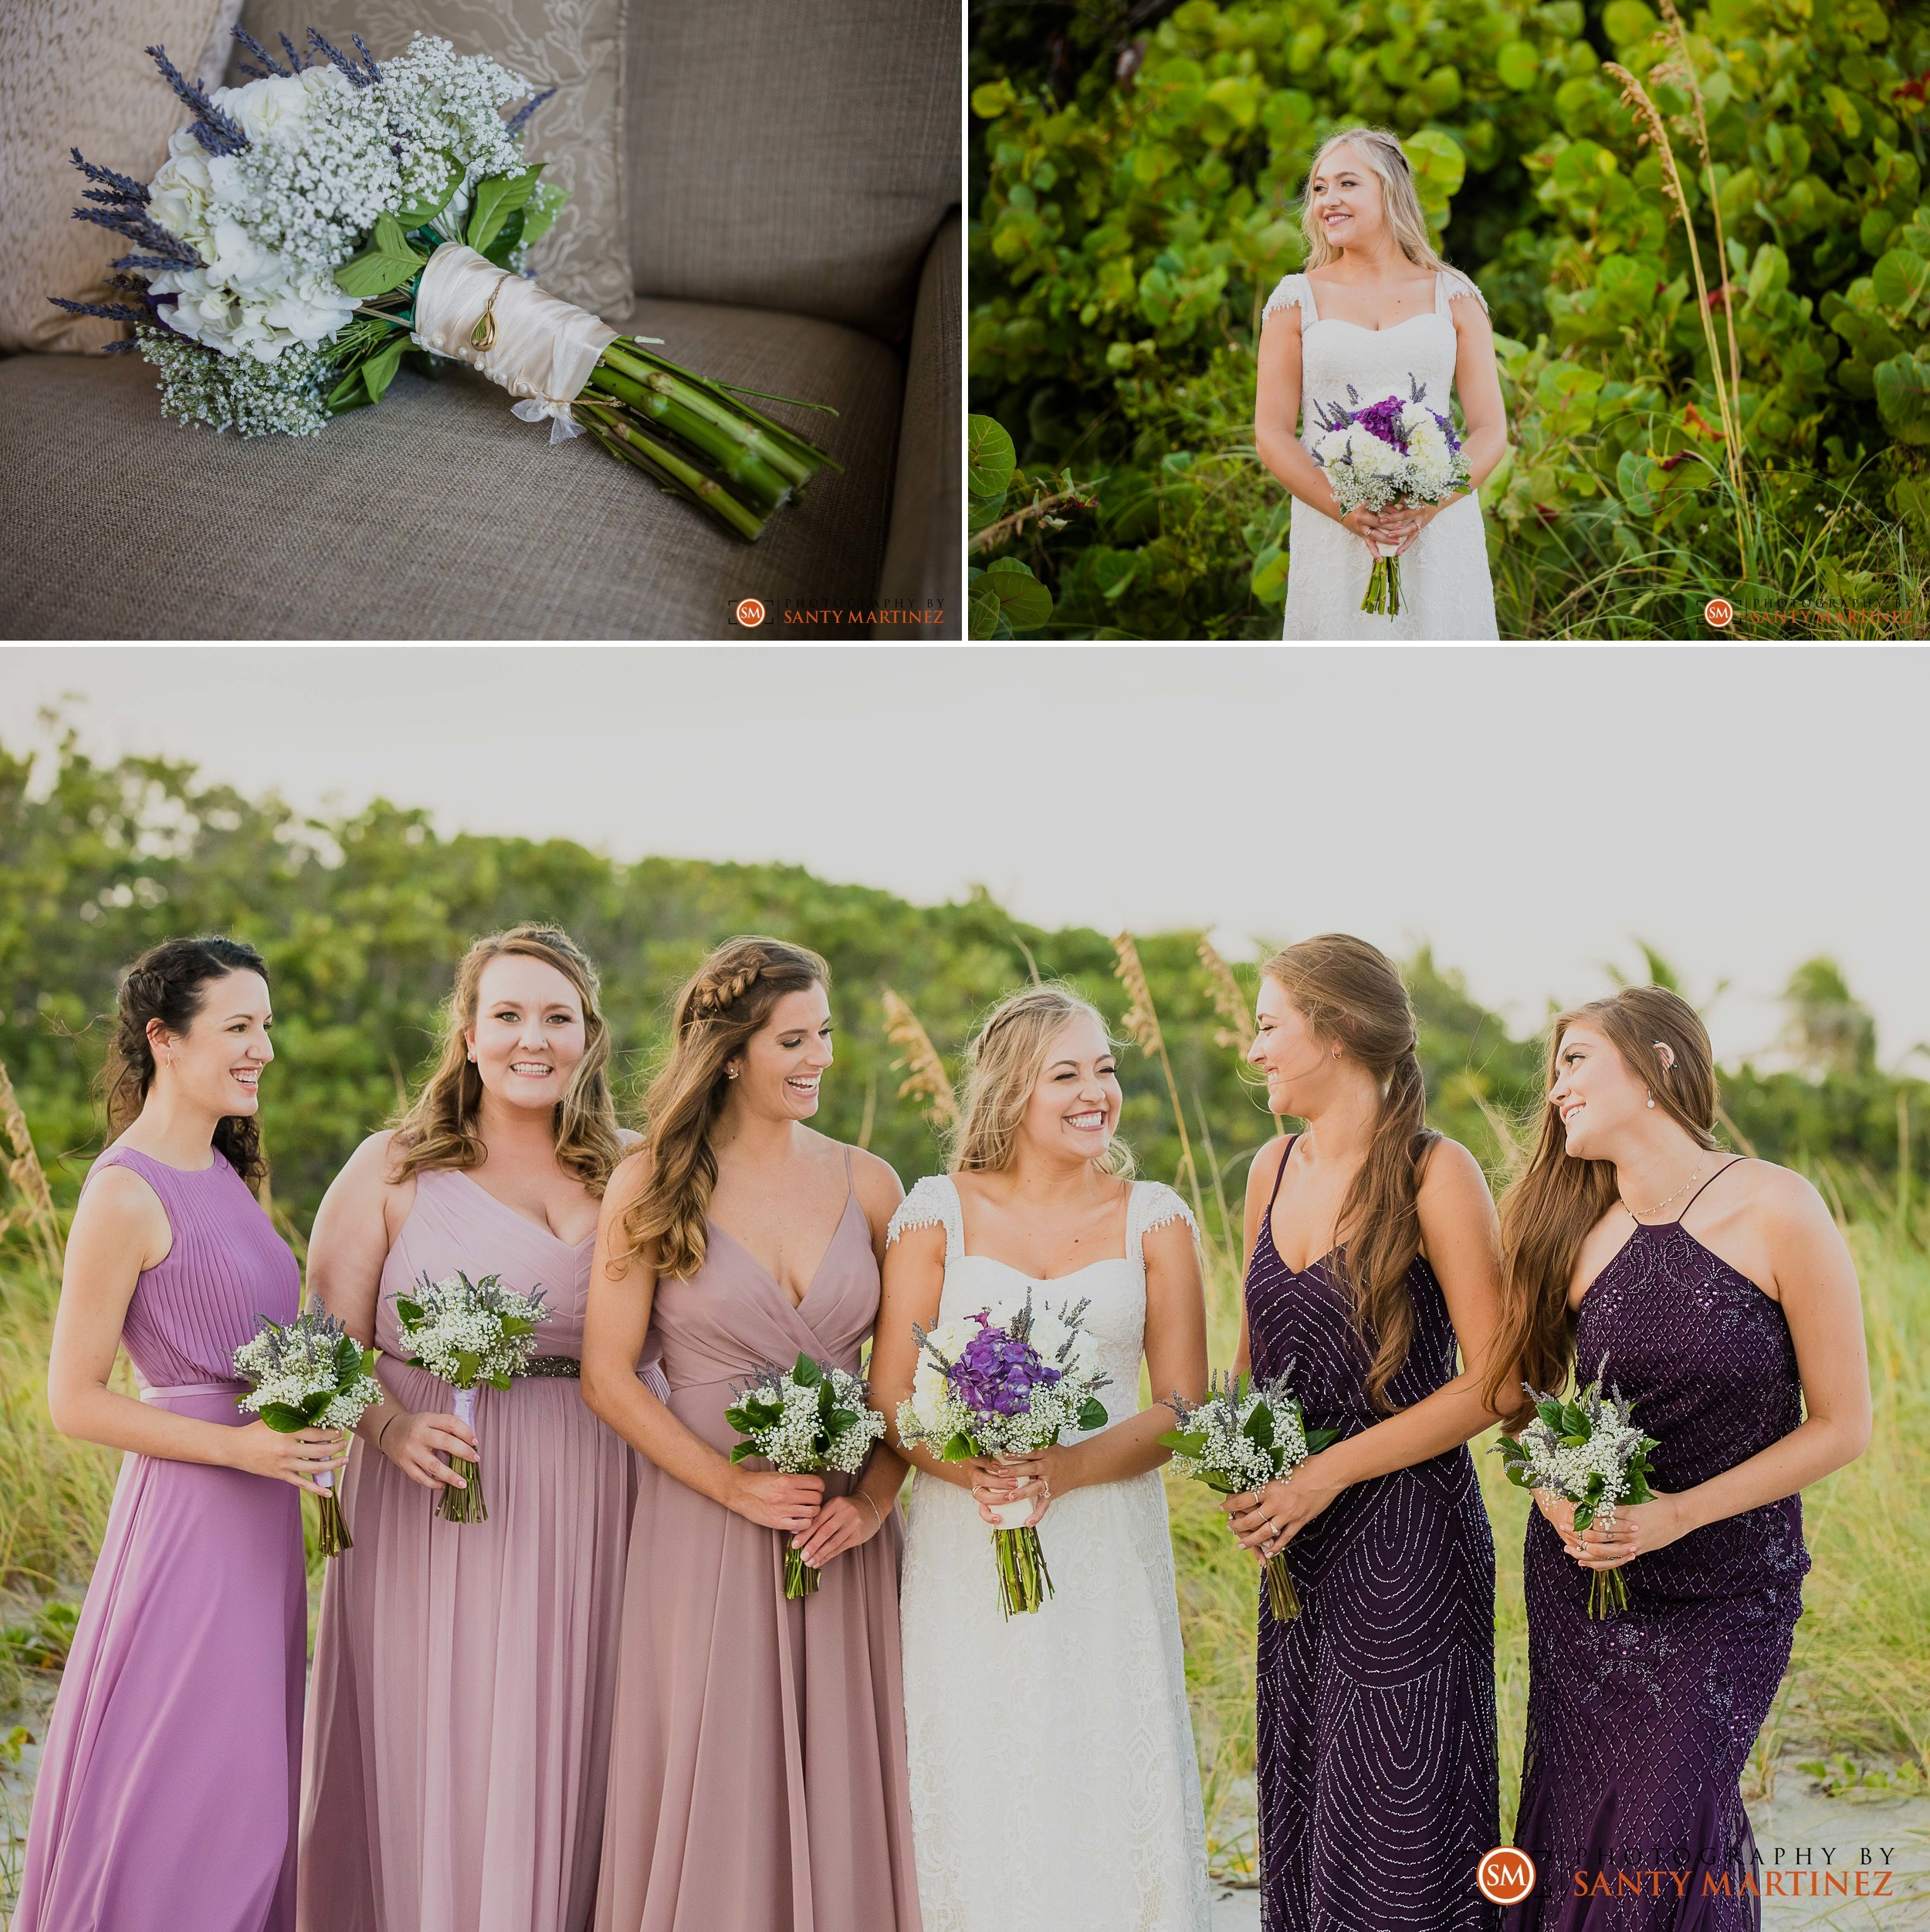 Wedding - Seagate Beach Club - Hotel - Delray Beach - Santy Martinez Photography 4.jpg